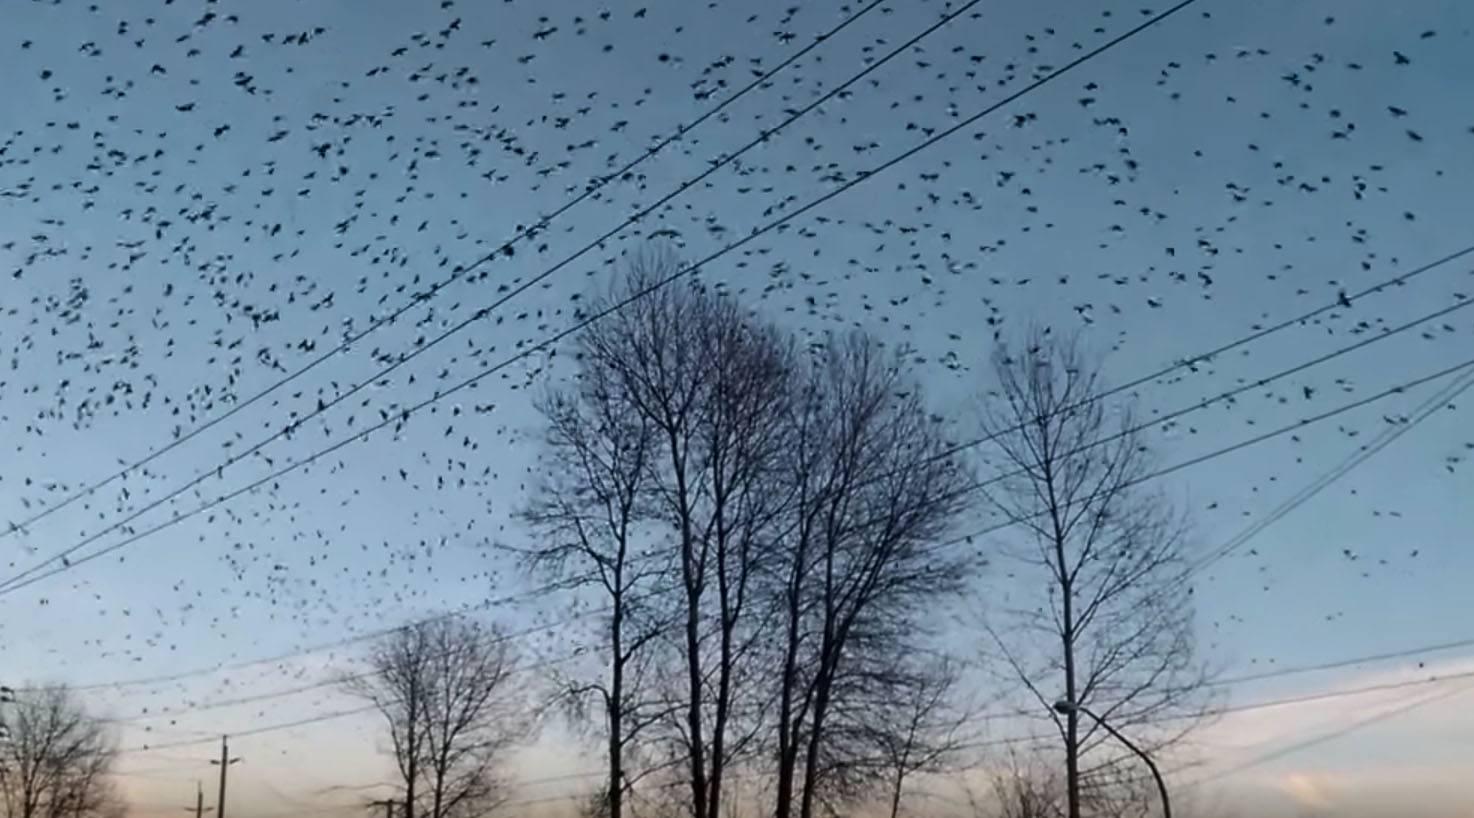 Crows flying over Burnaby (mellalune/YouTube)